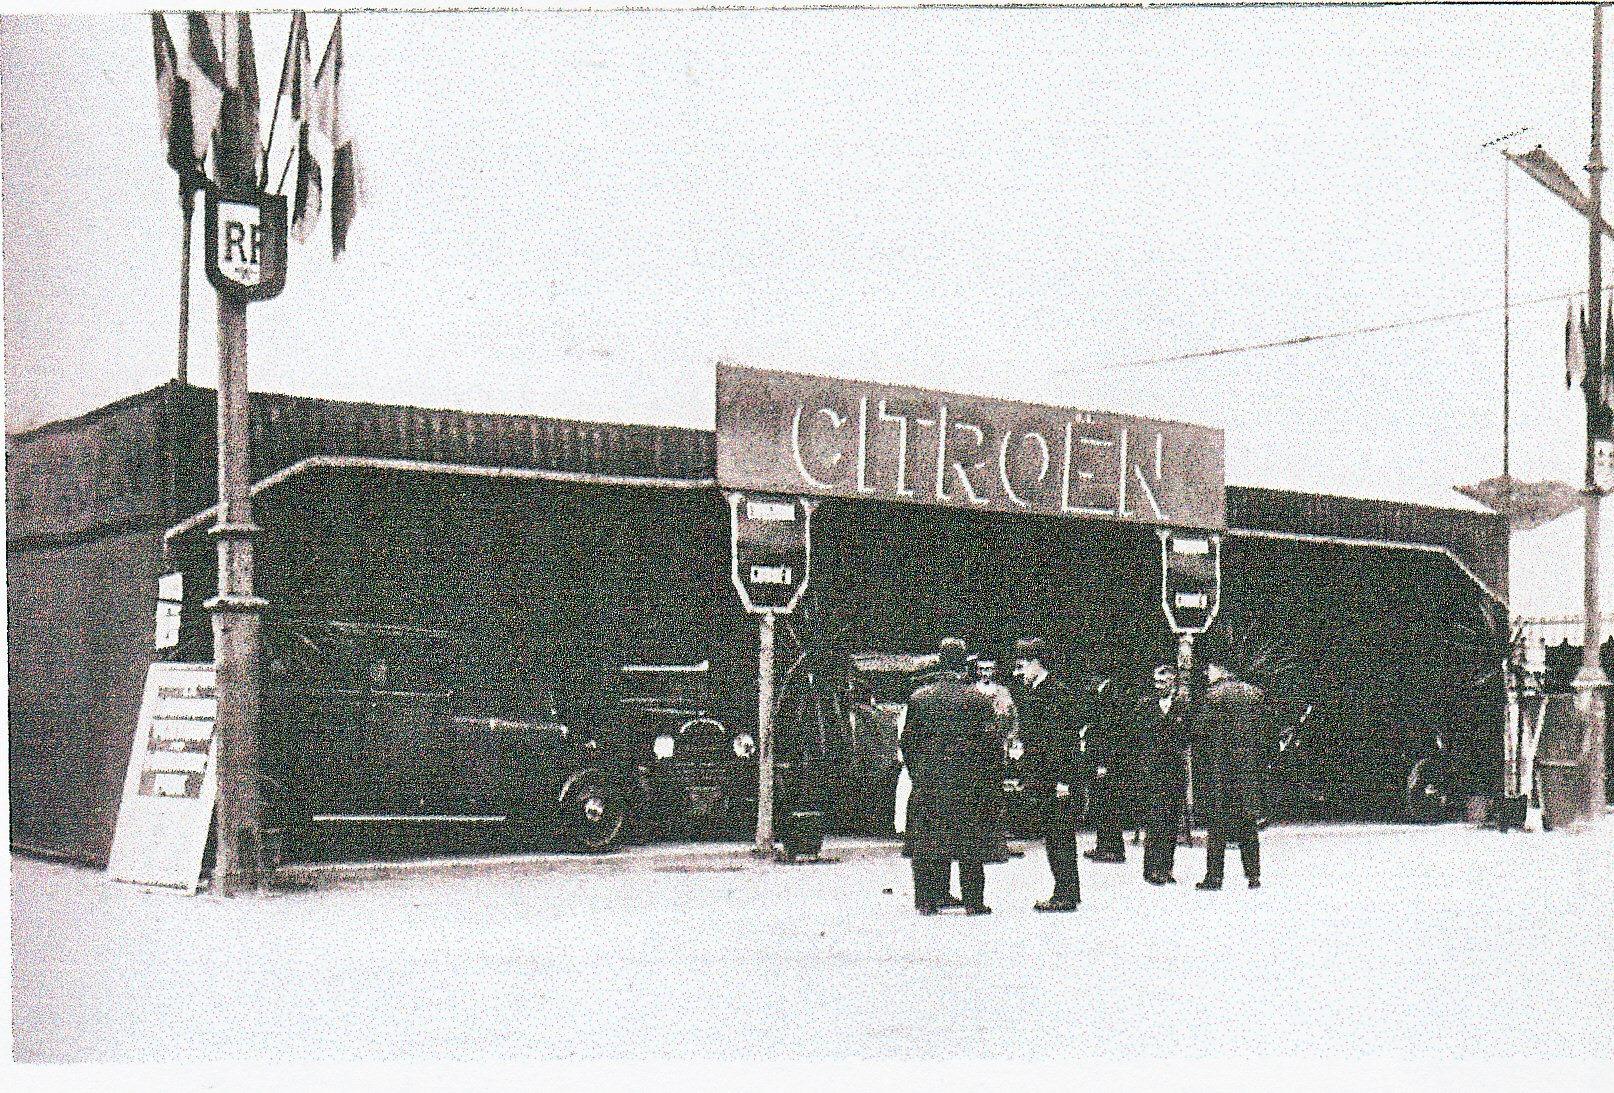 -Citroen-de-foire-SUCCURSALE-CITROEN-a-NIORT-79-2